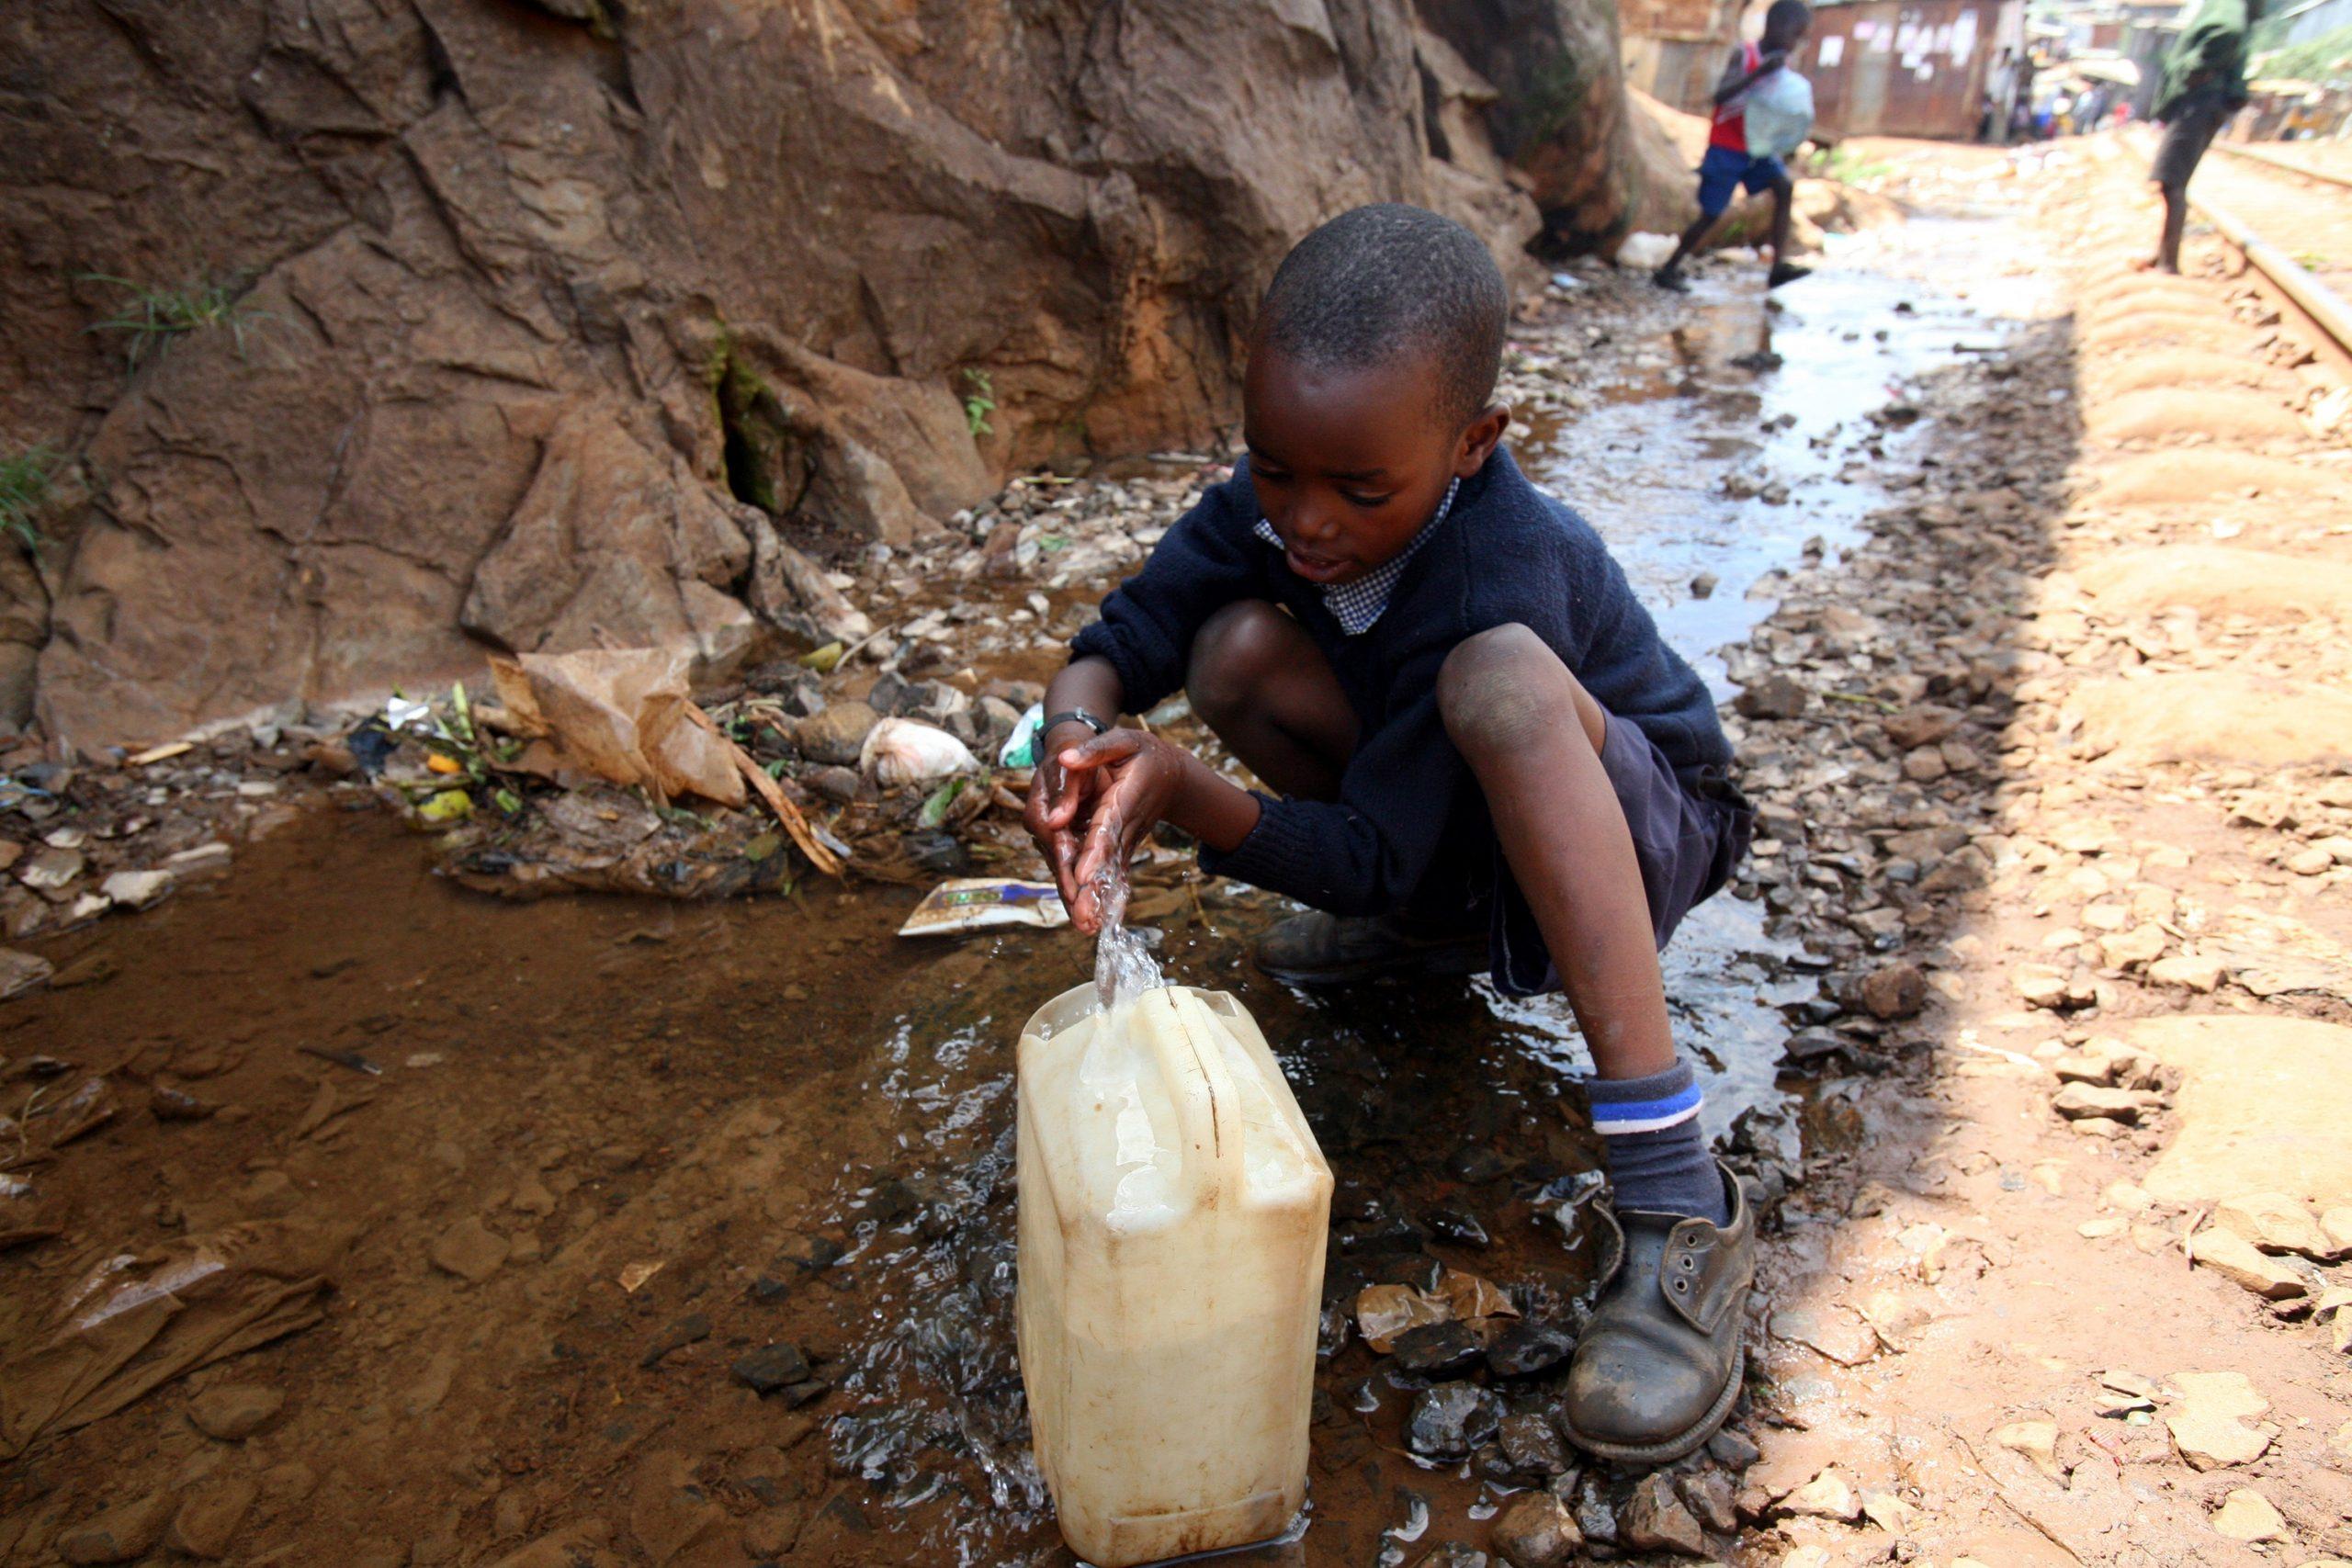 Cholera Outbreak Kills 325 in Nigeria